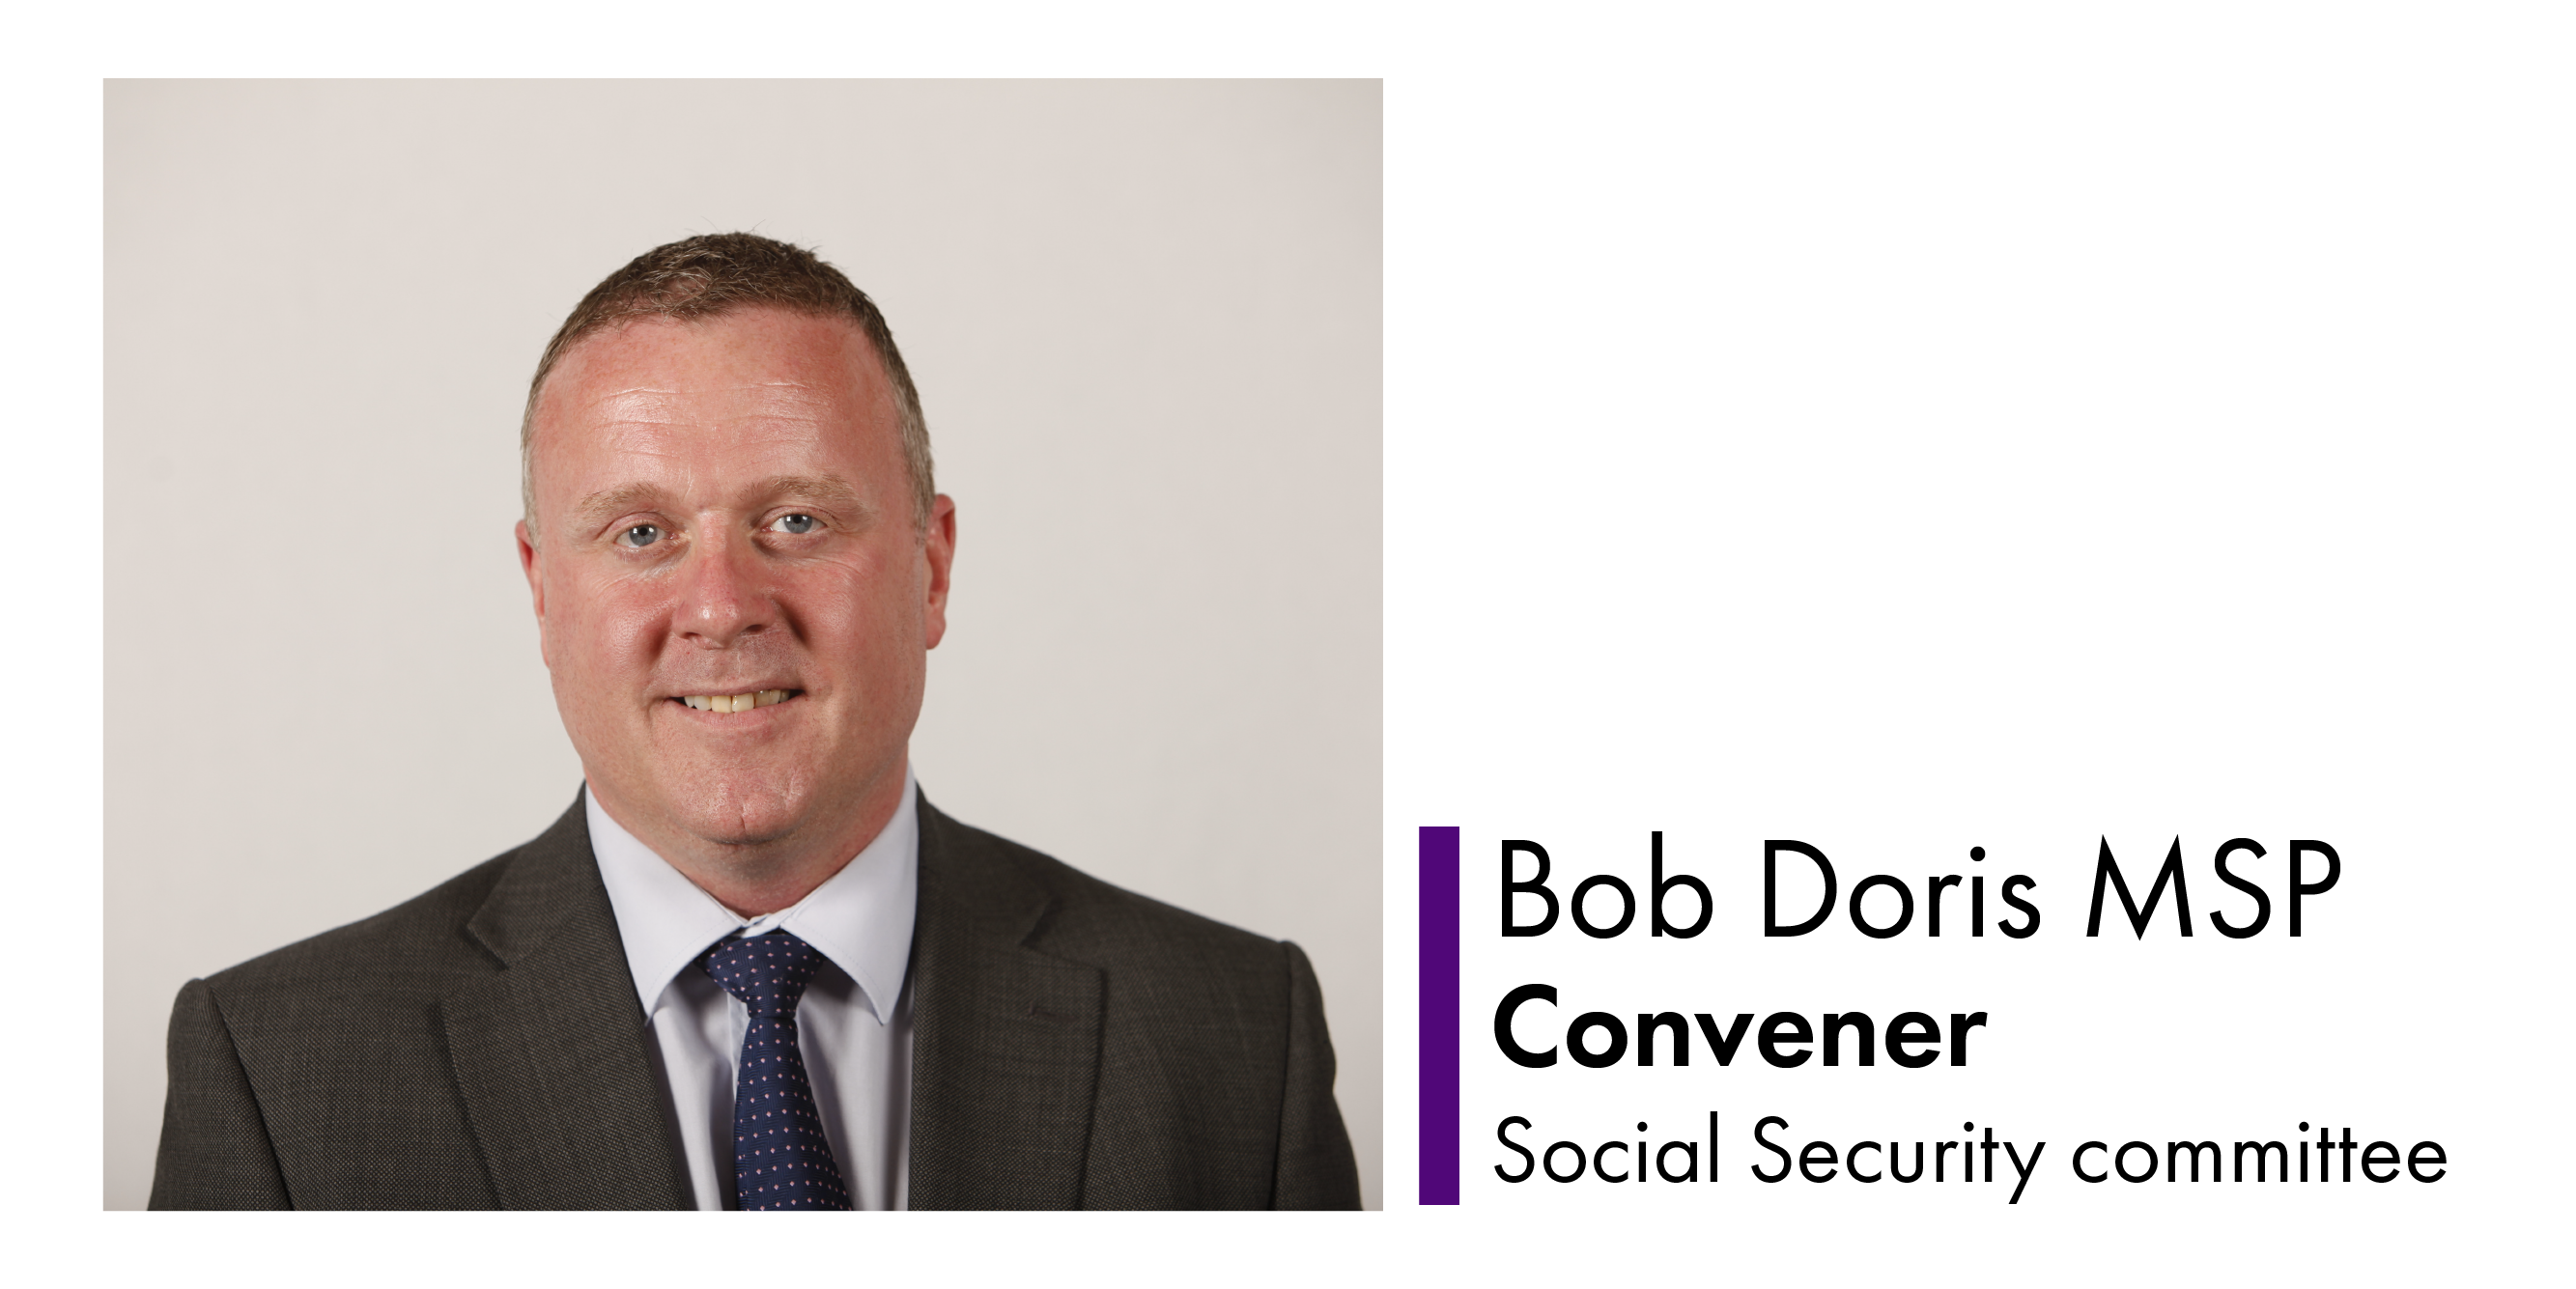 Photo of Bob Doris MSP, Convener of the Social Security Committee